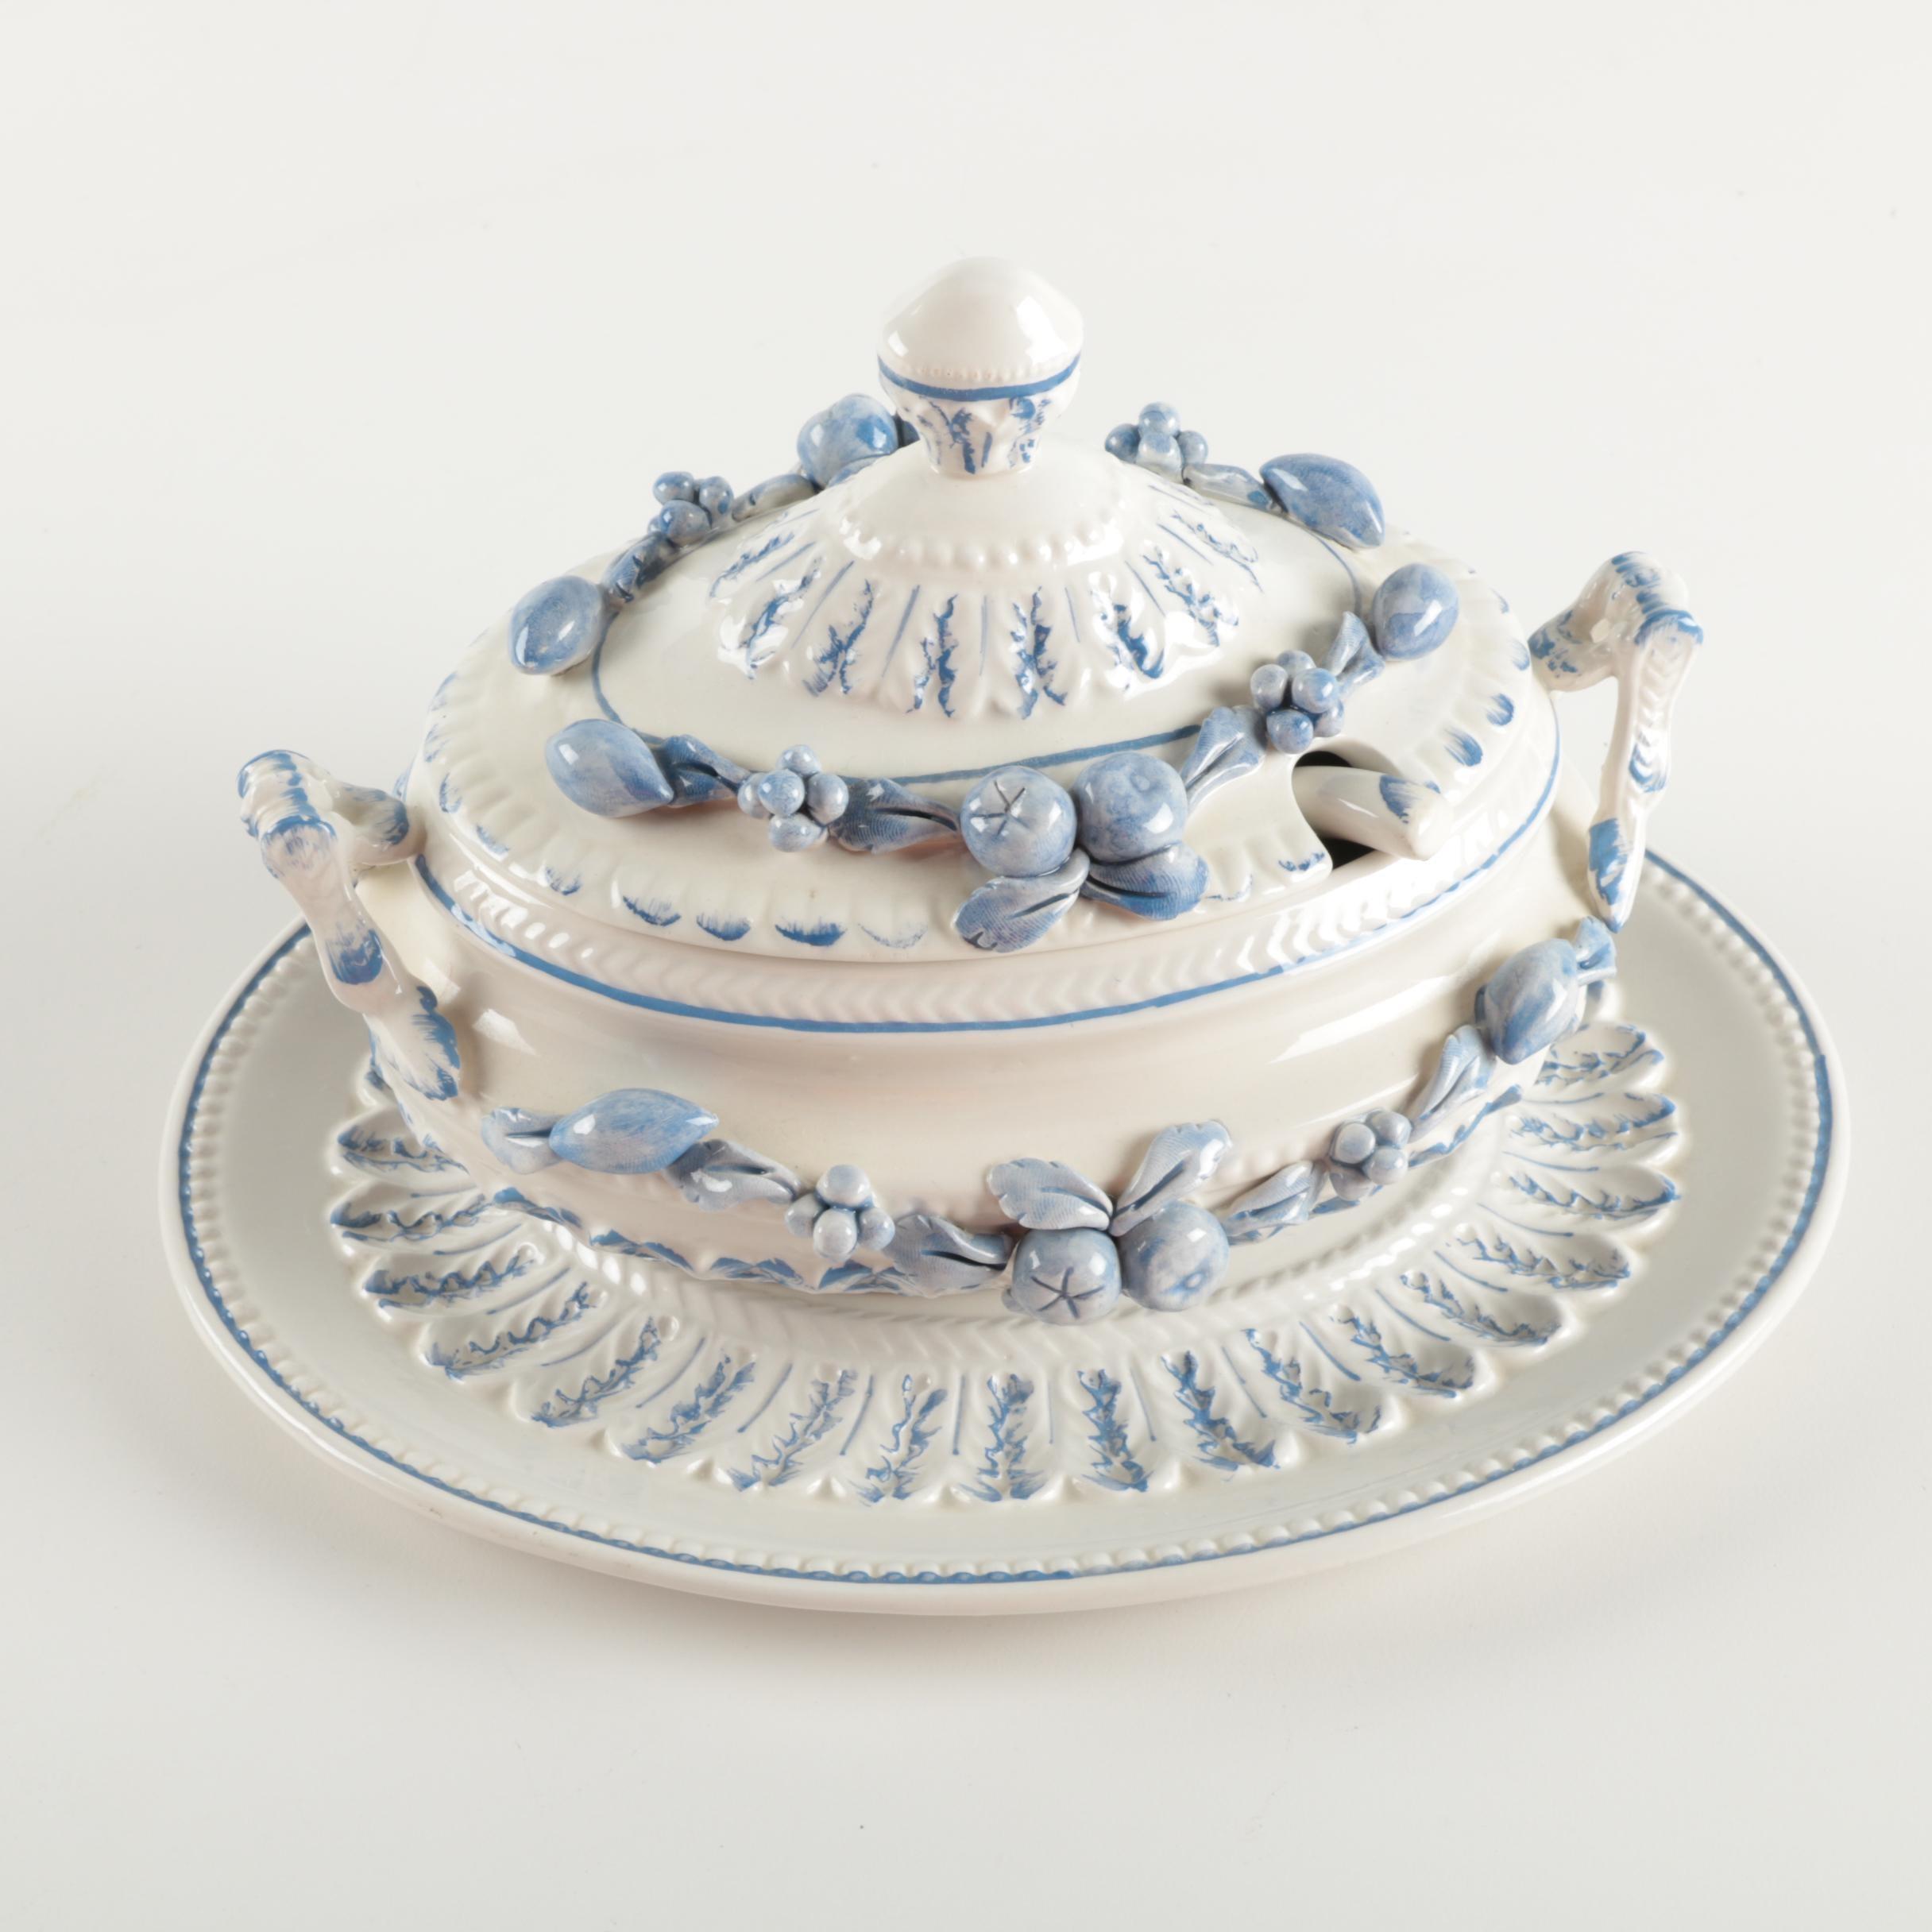 Italian J. W. Co. Ceramic Tureen and Platter